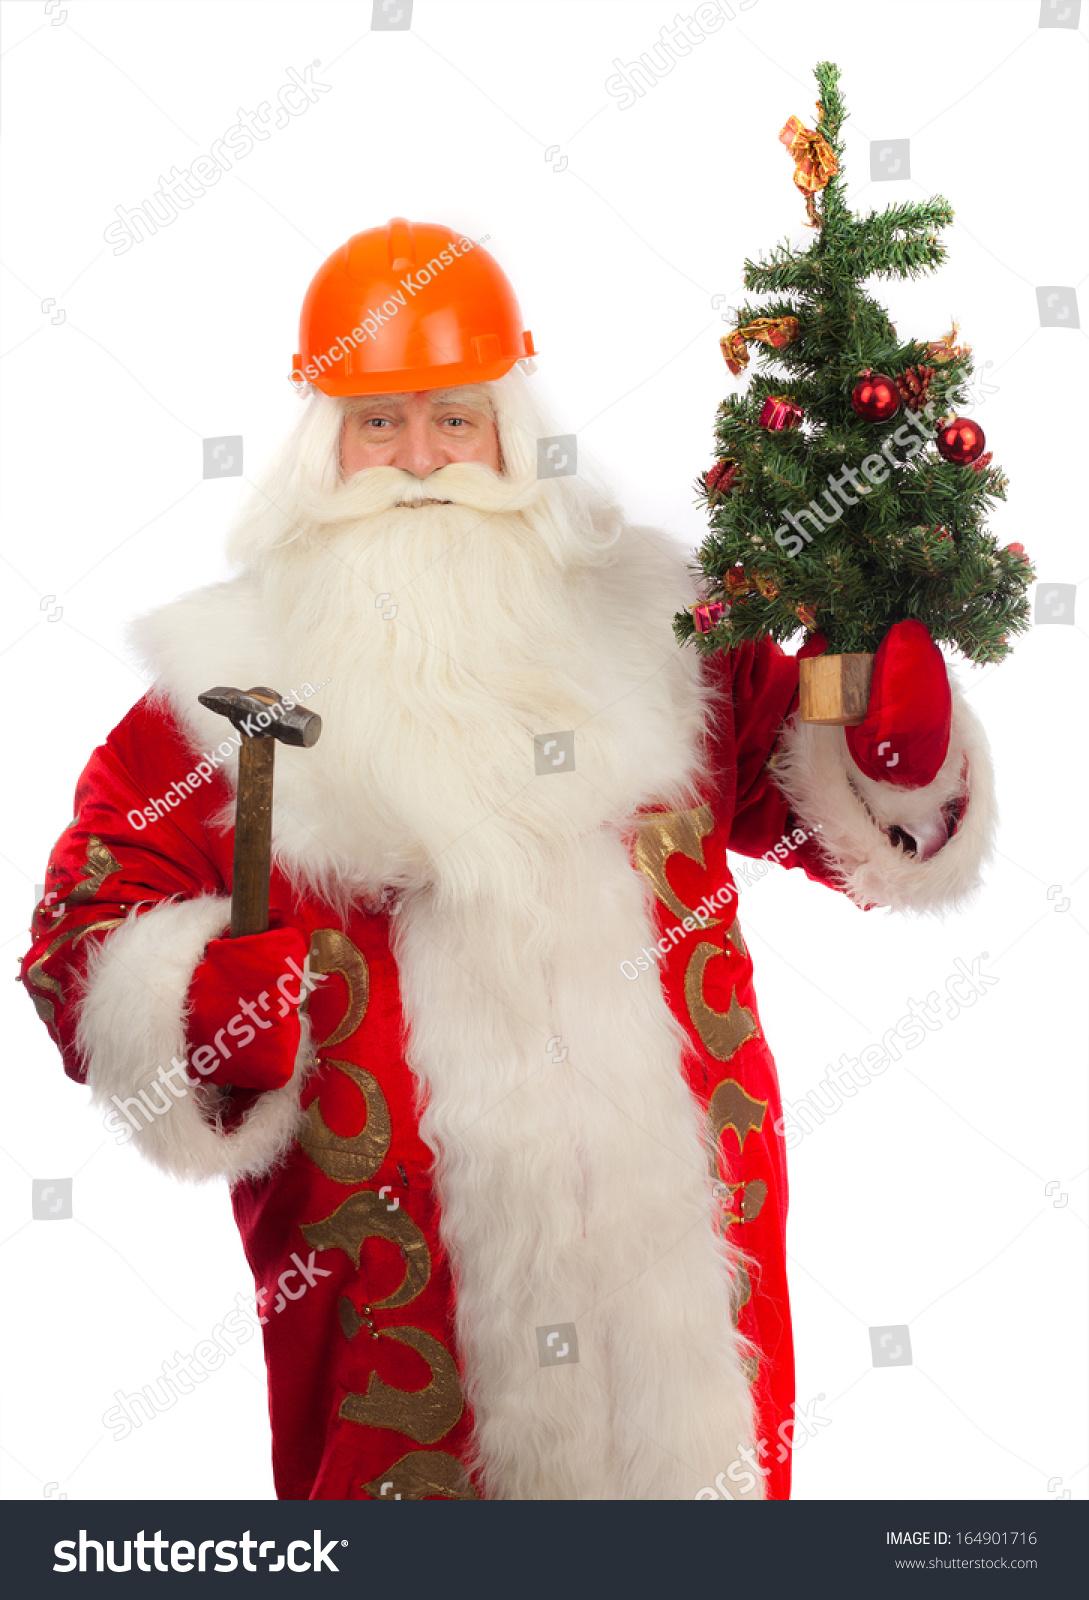 Santa Claus Christmas Tree Construction Helmet Stock Photo (Edit Now ...